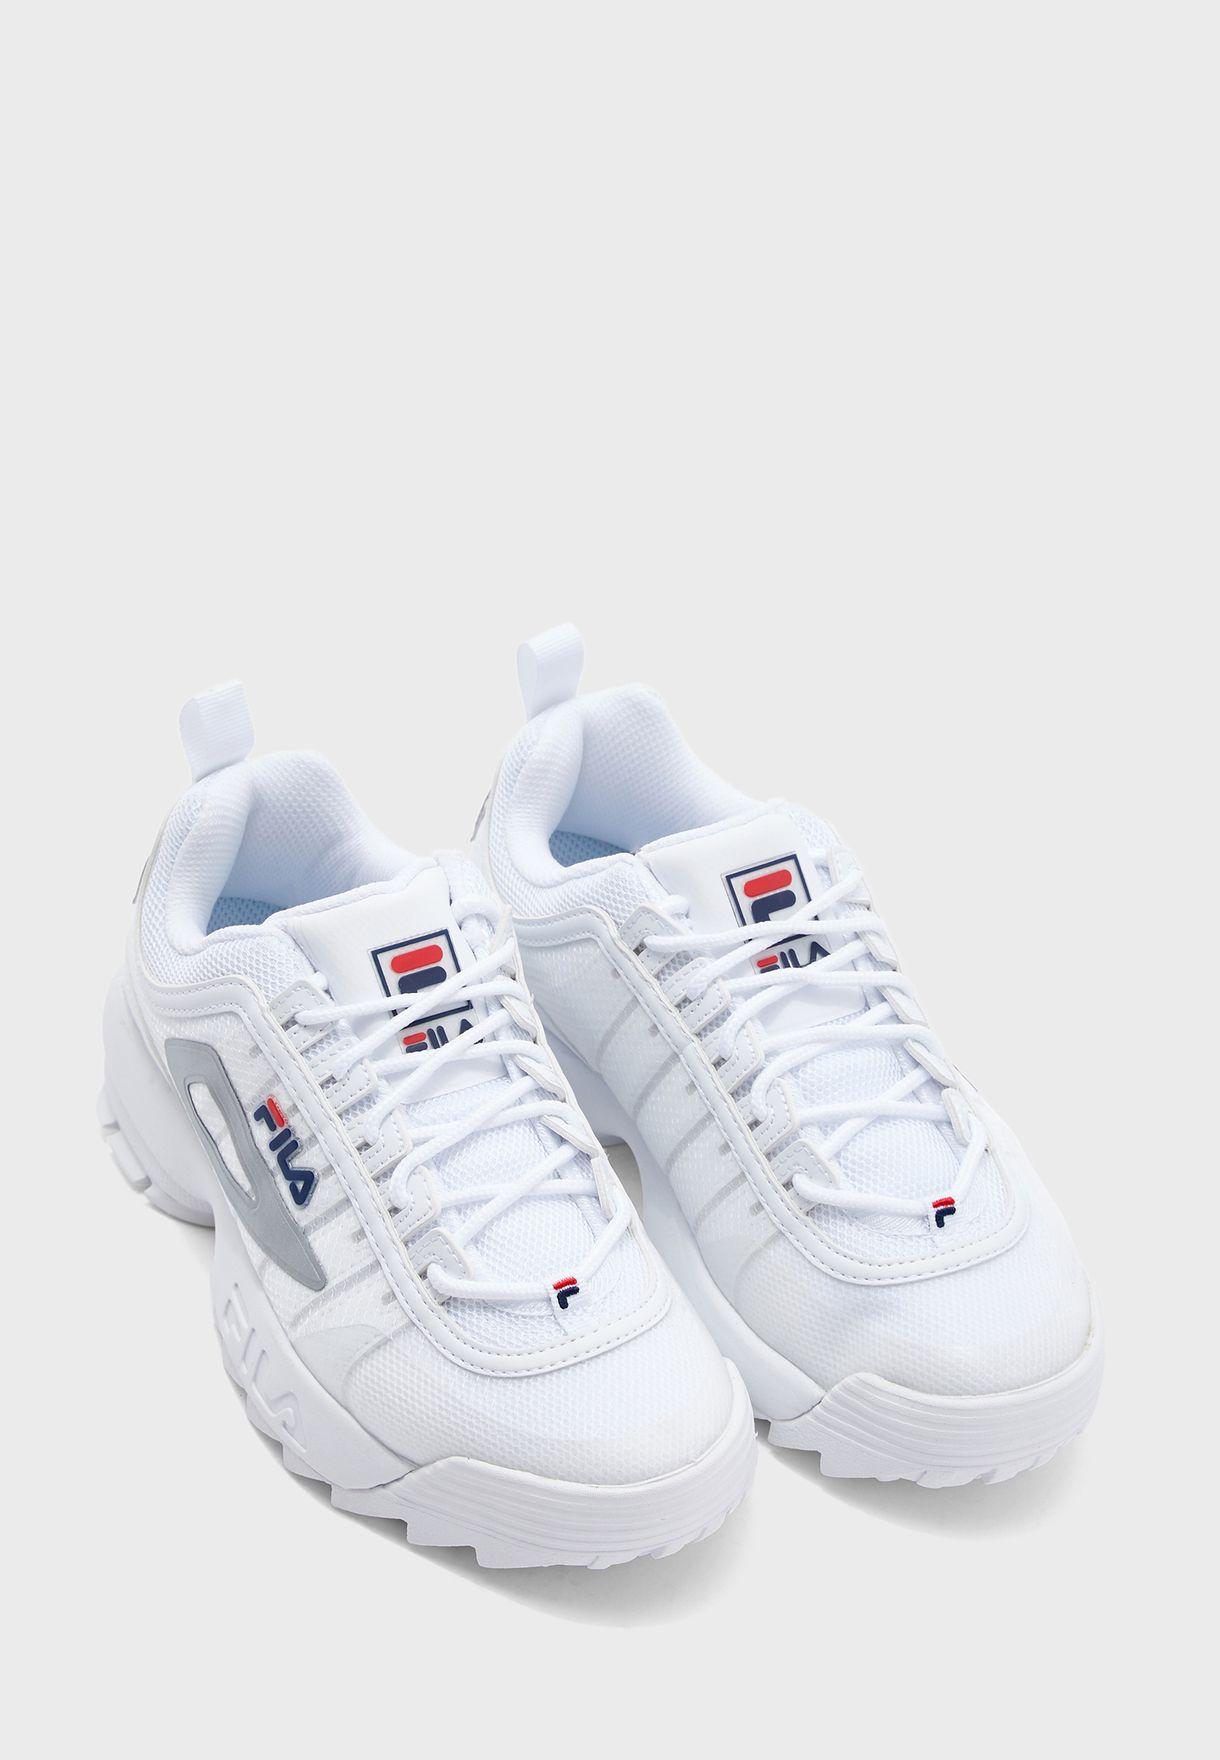 حذاء ديسربتر 2 مونوميش